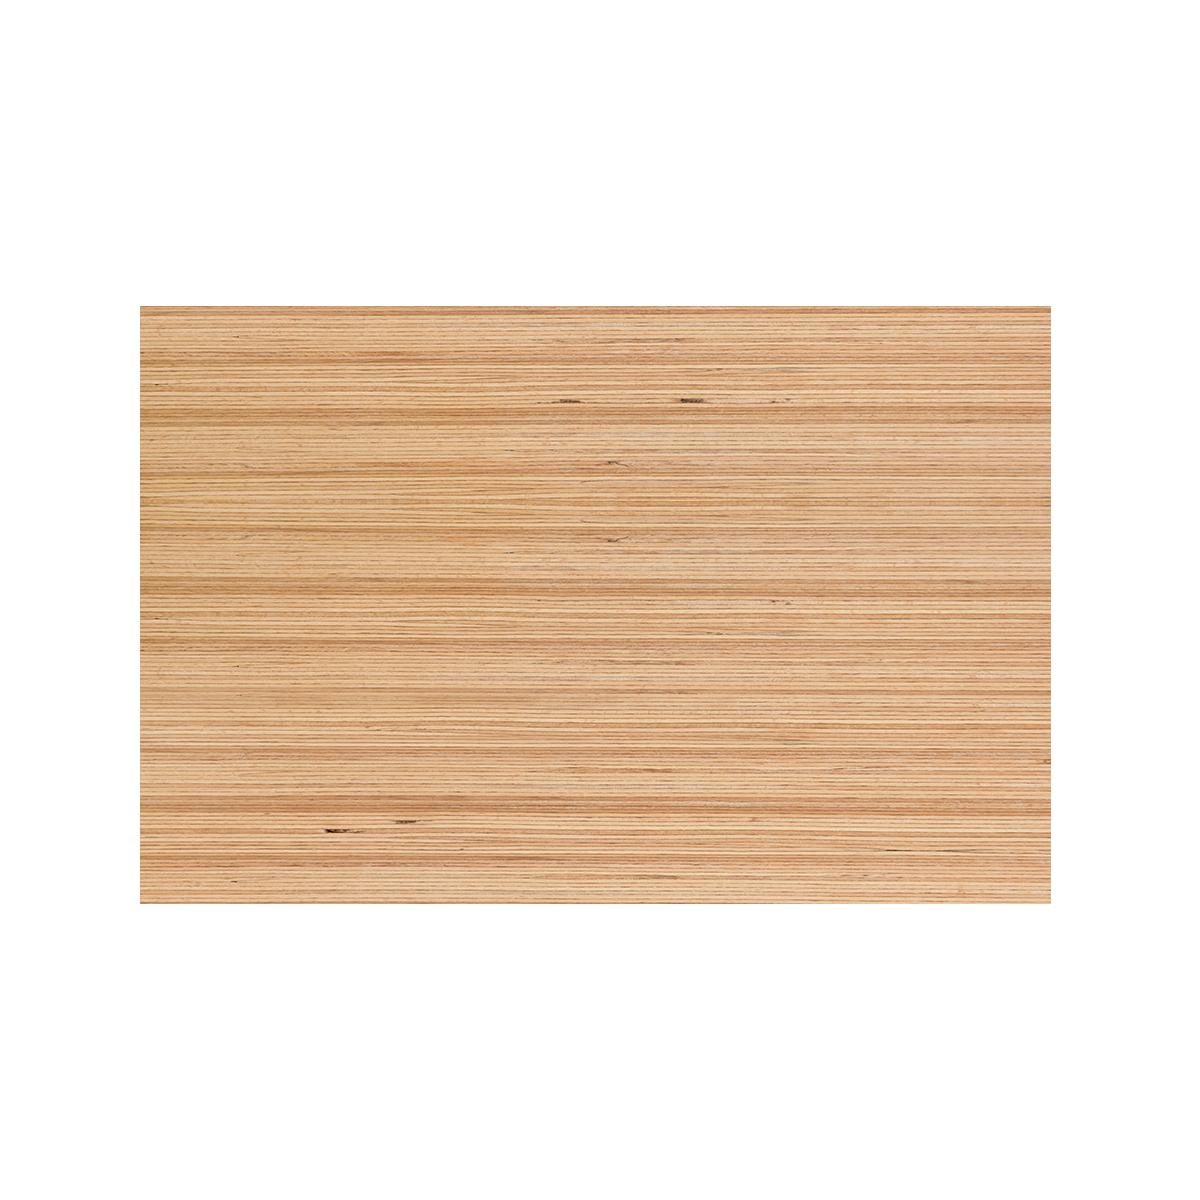 arbeitsplatte baubuche 90cm baubuche arbeitsplatten. Black Bedroom Furniture Sets. Home Design Ideas